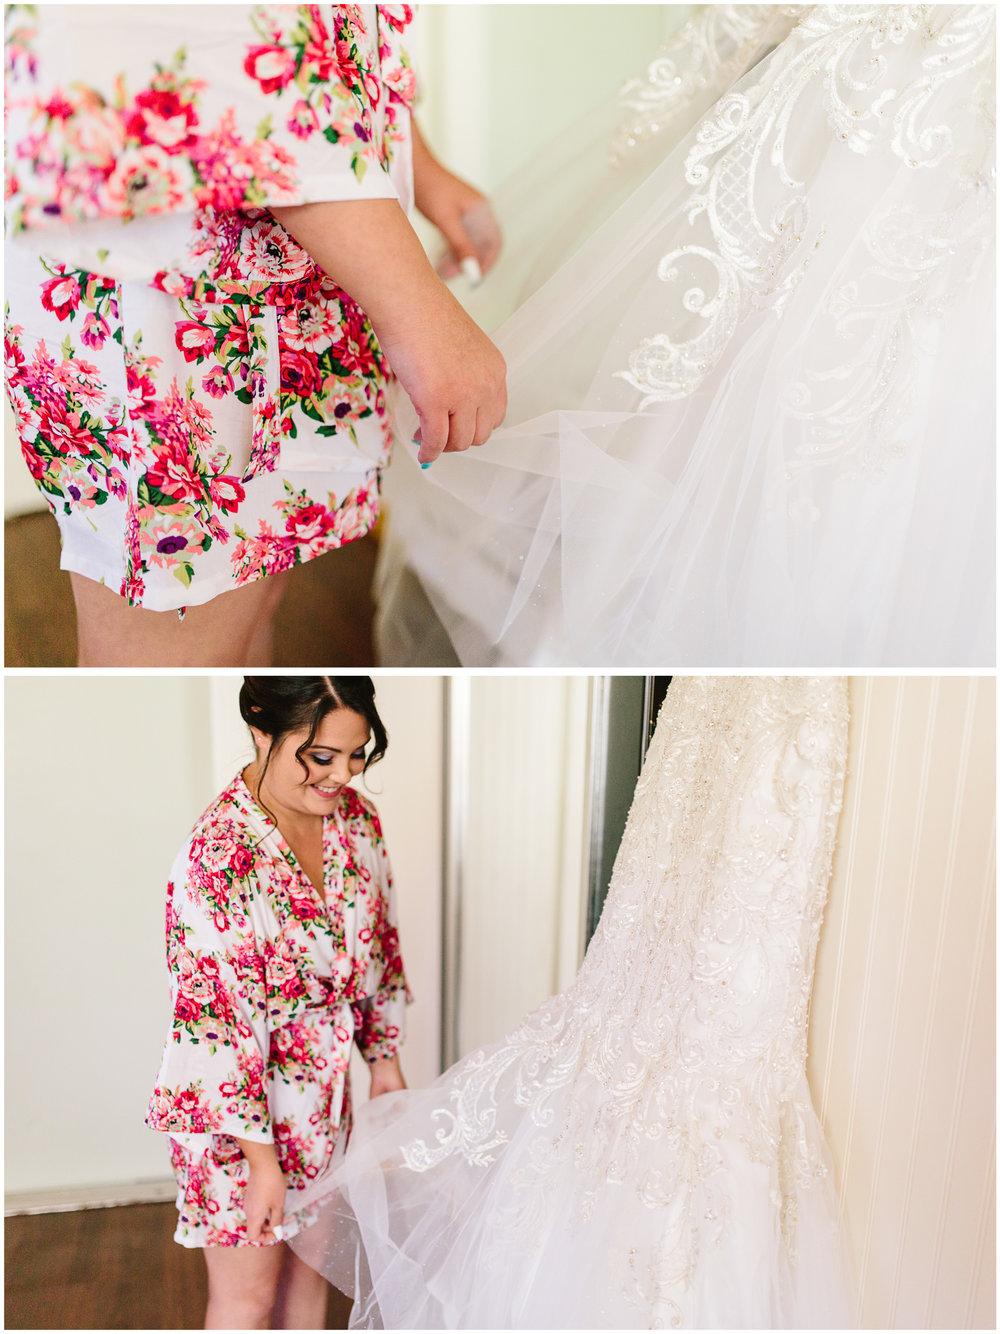 pine_colorado_wedding_7.jpg